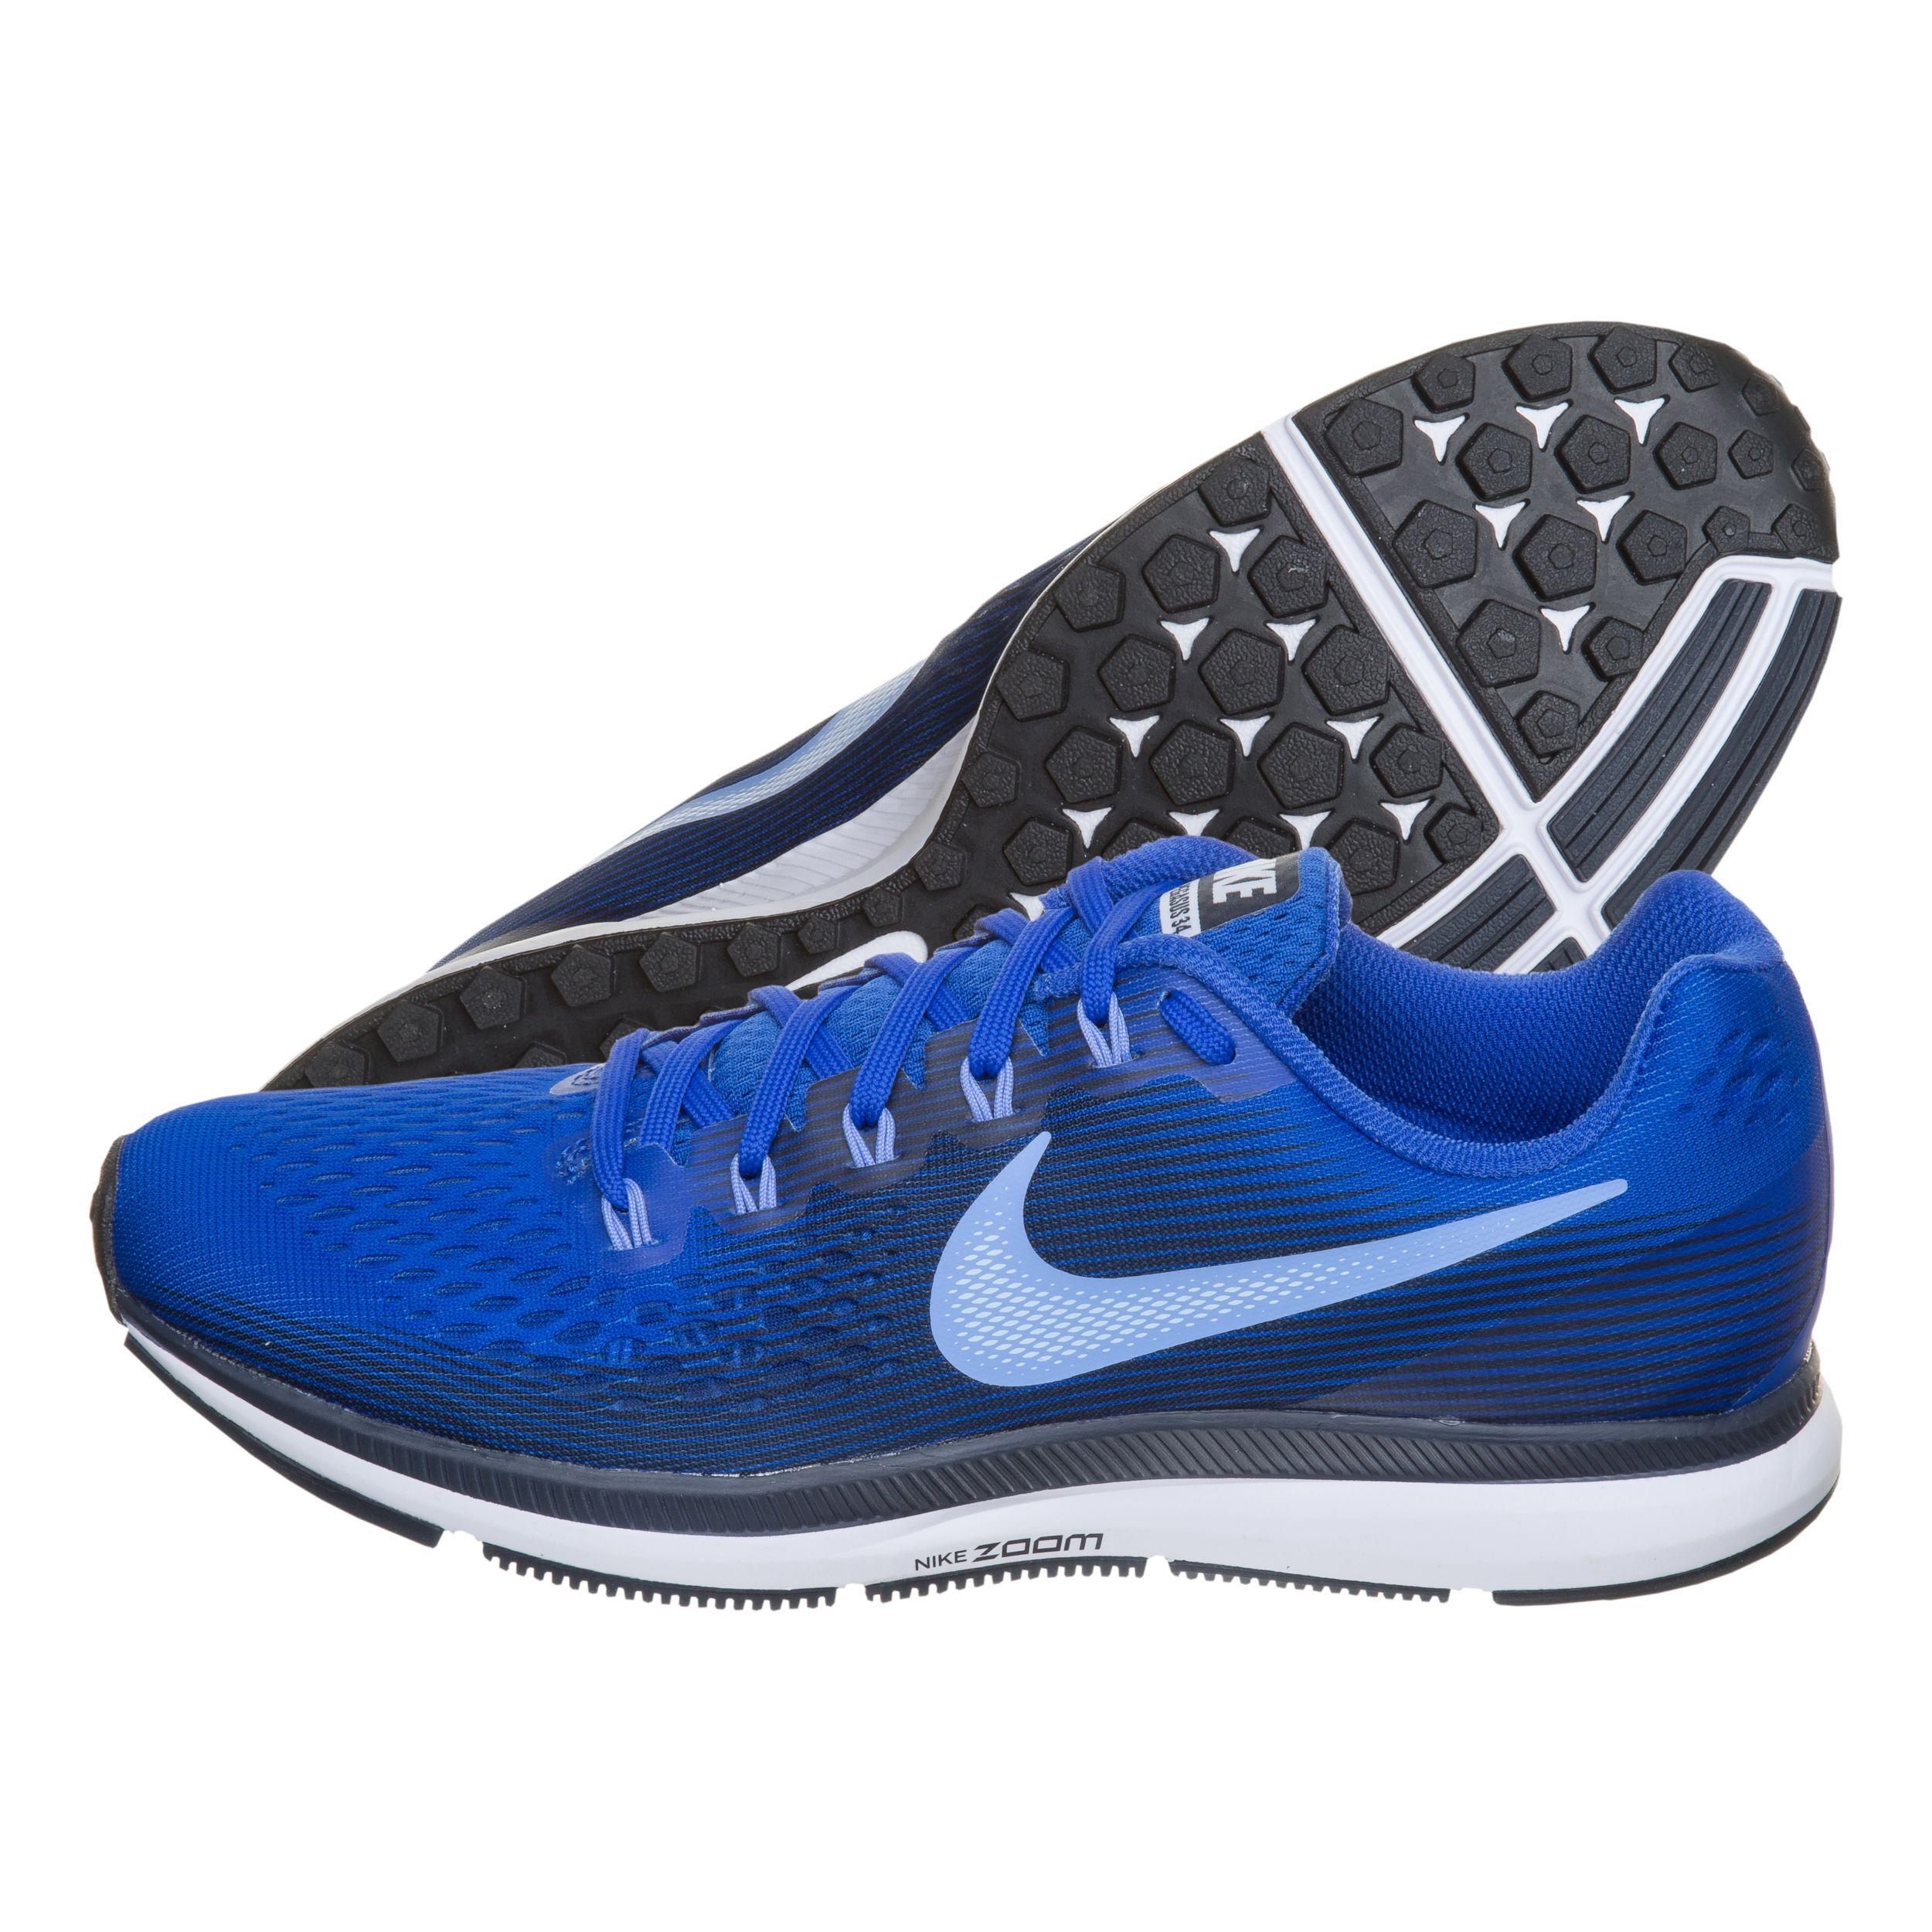 online store 915cd cefe7 3 Herre Blå Nike Zoom Running Shoes Pegasus 6TT8tnawxq.